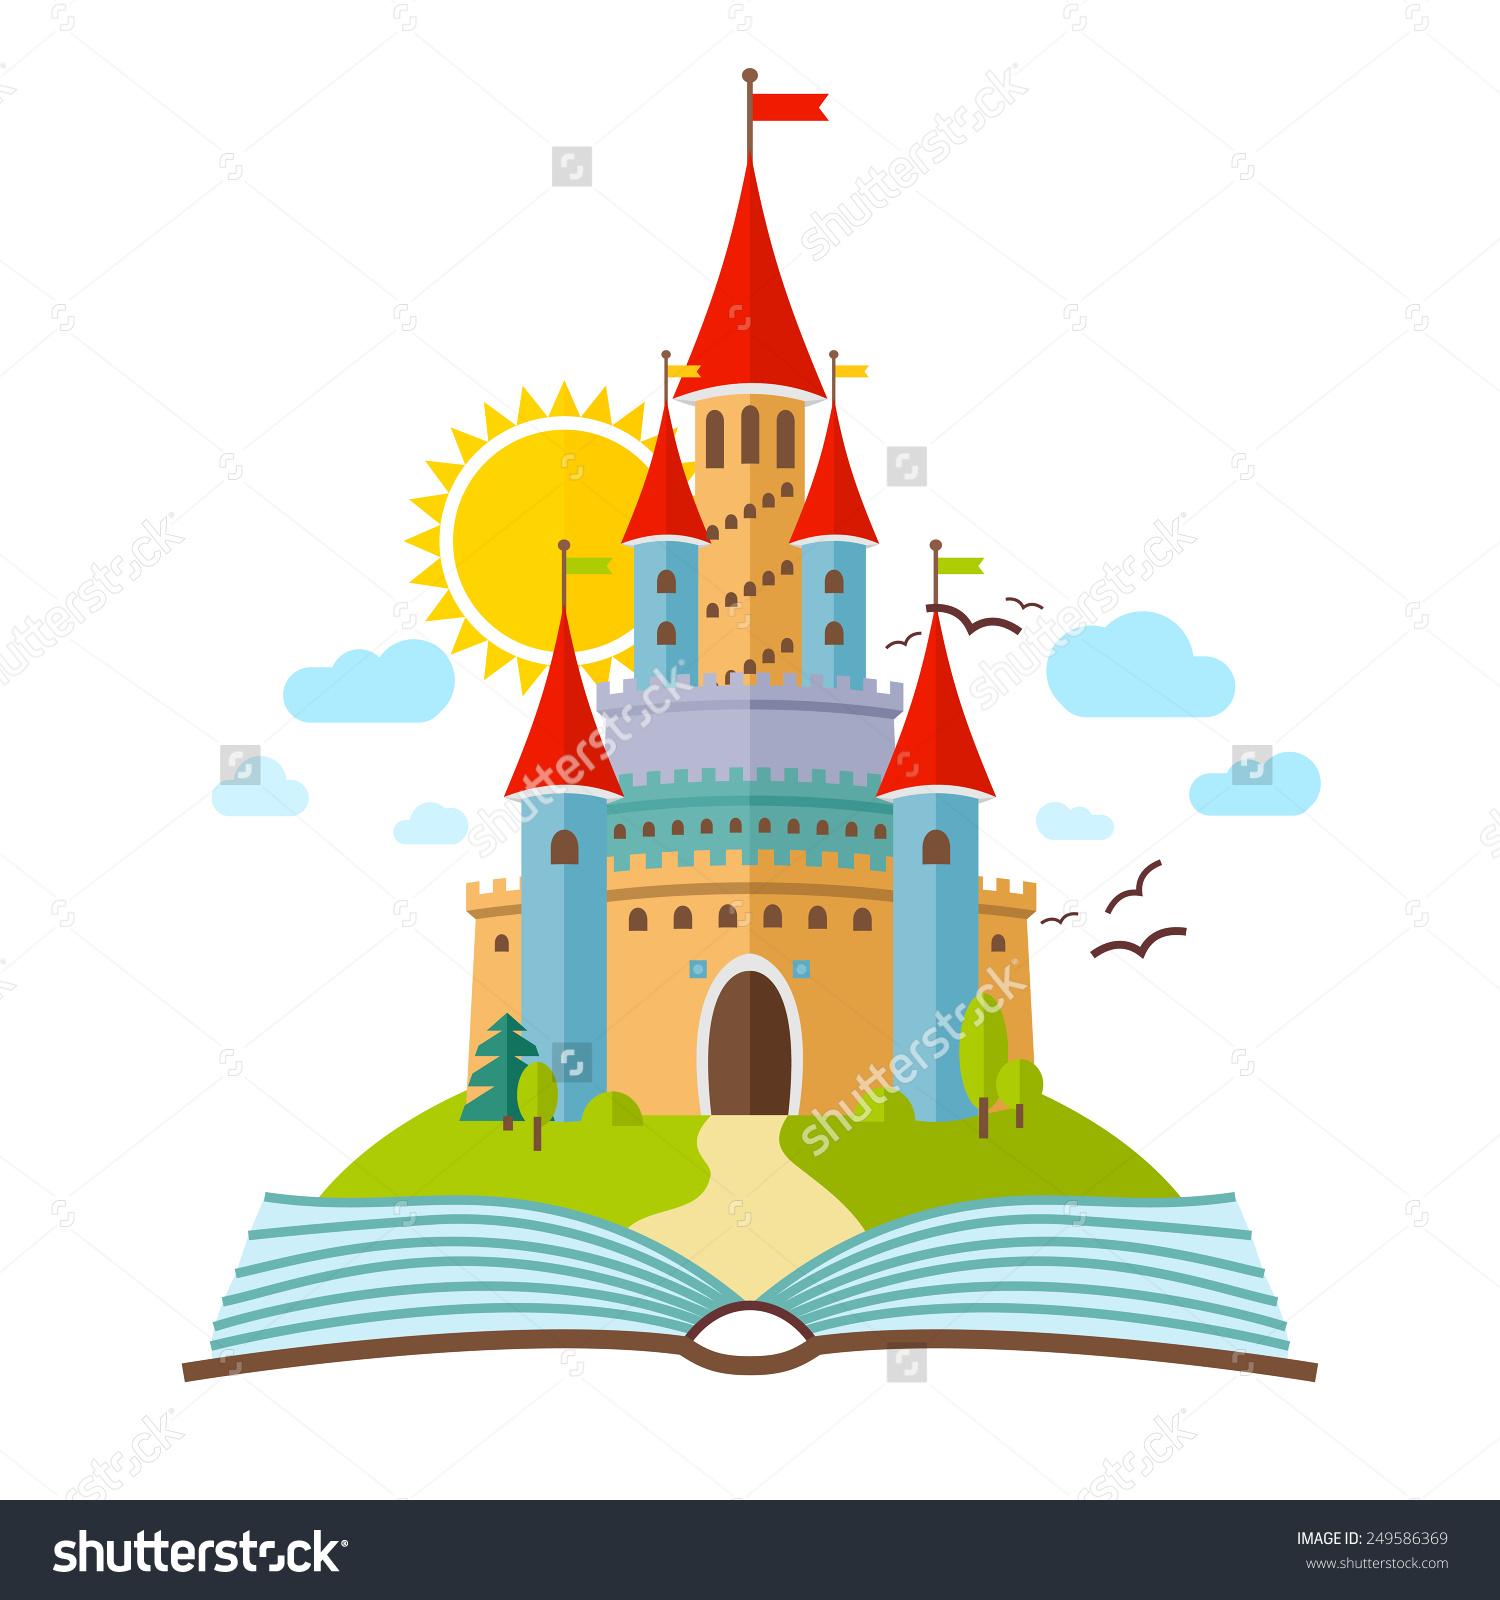 Fairytale Castle Vector Flat Child Illustration Stock Vector.